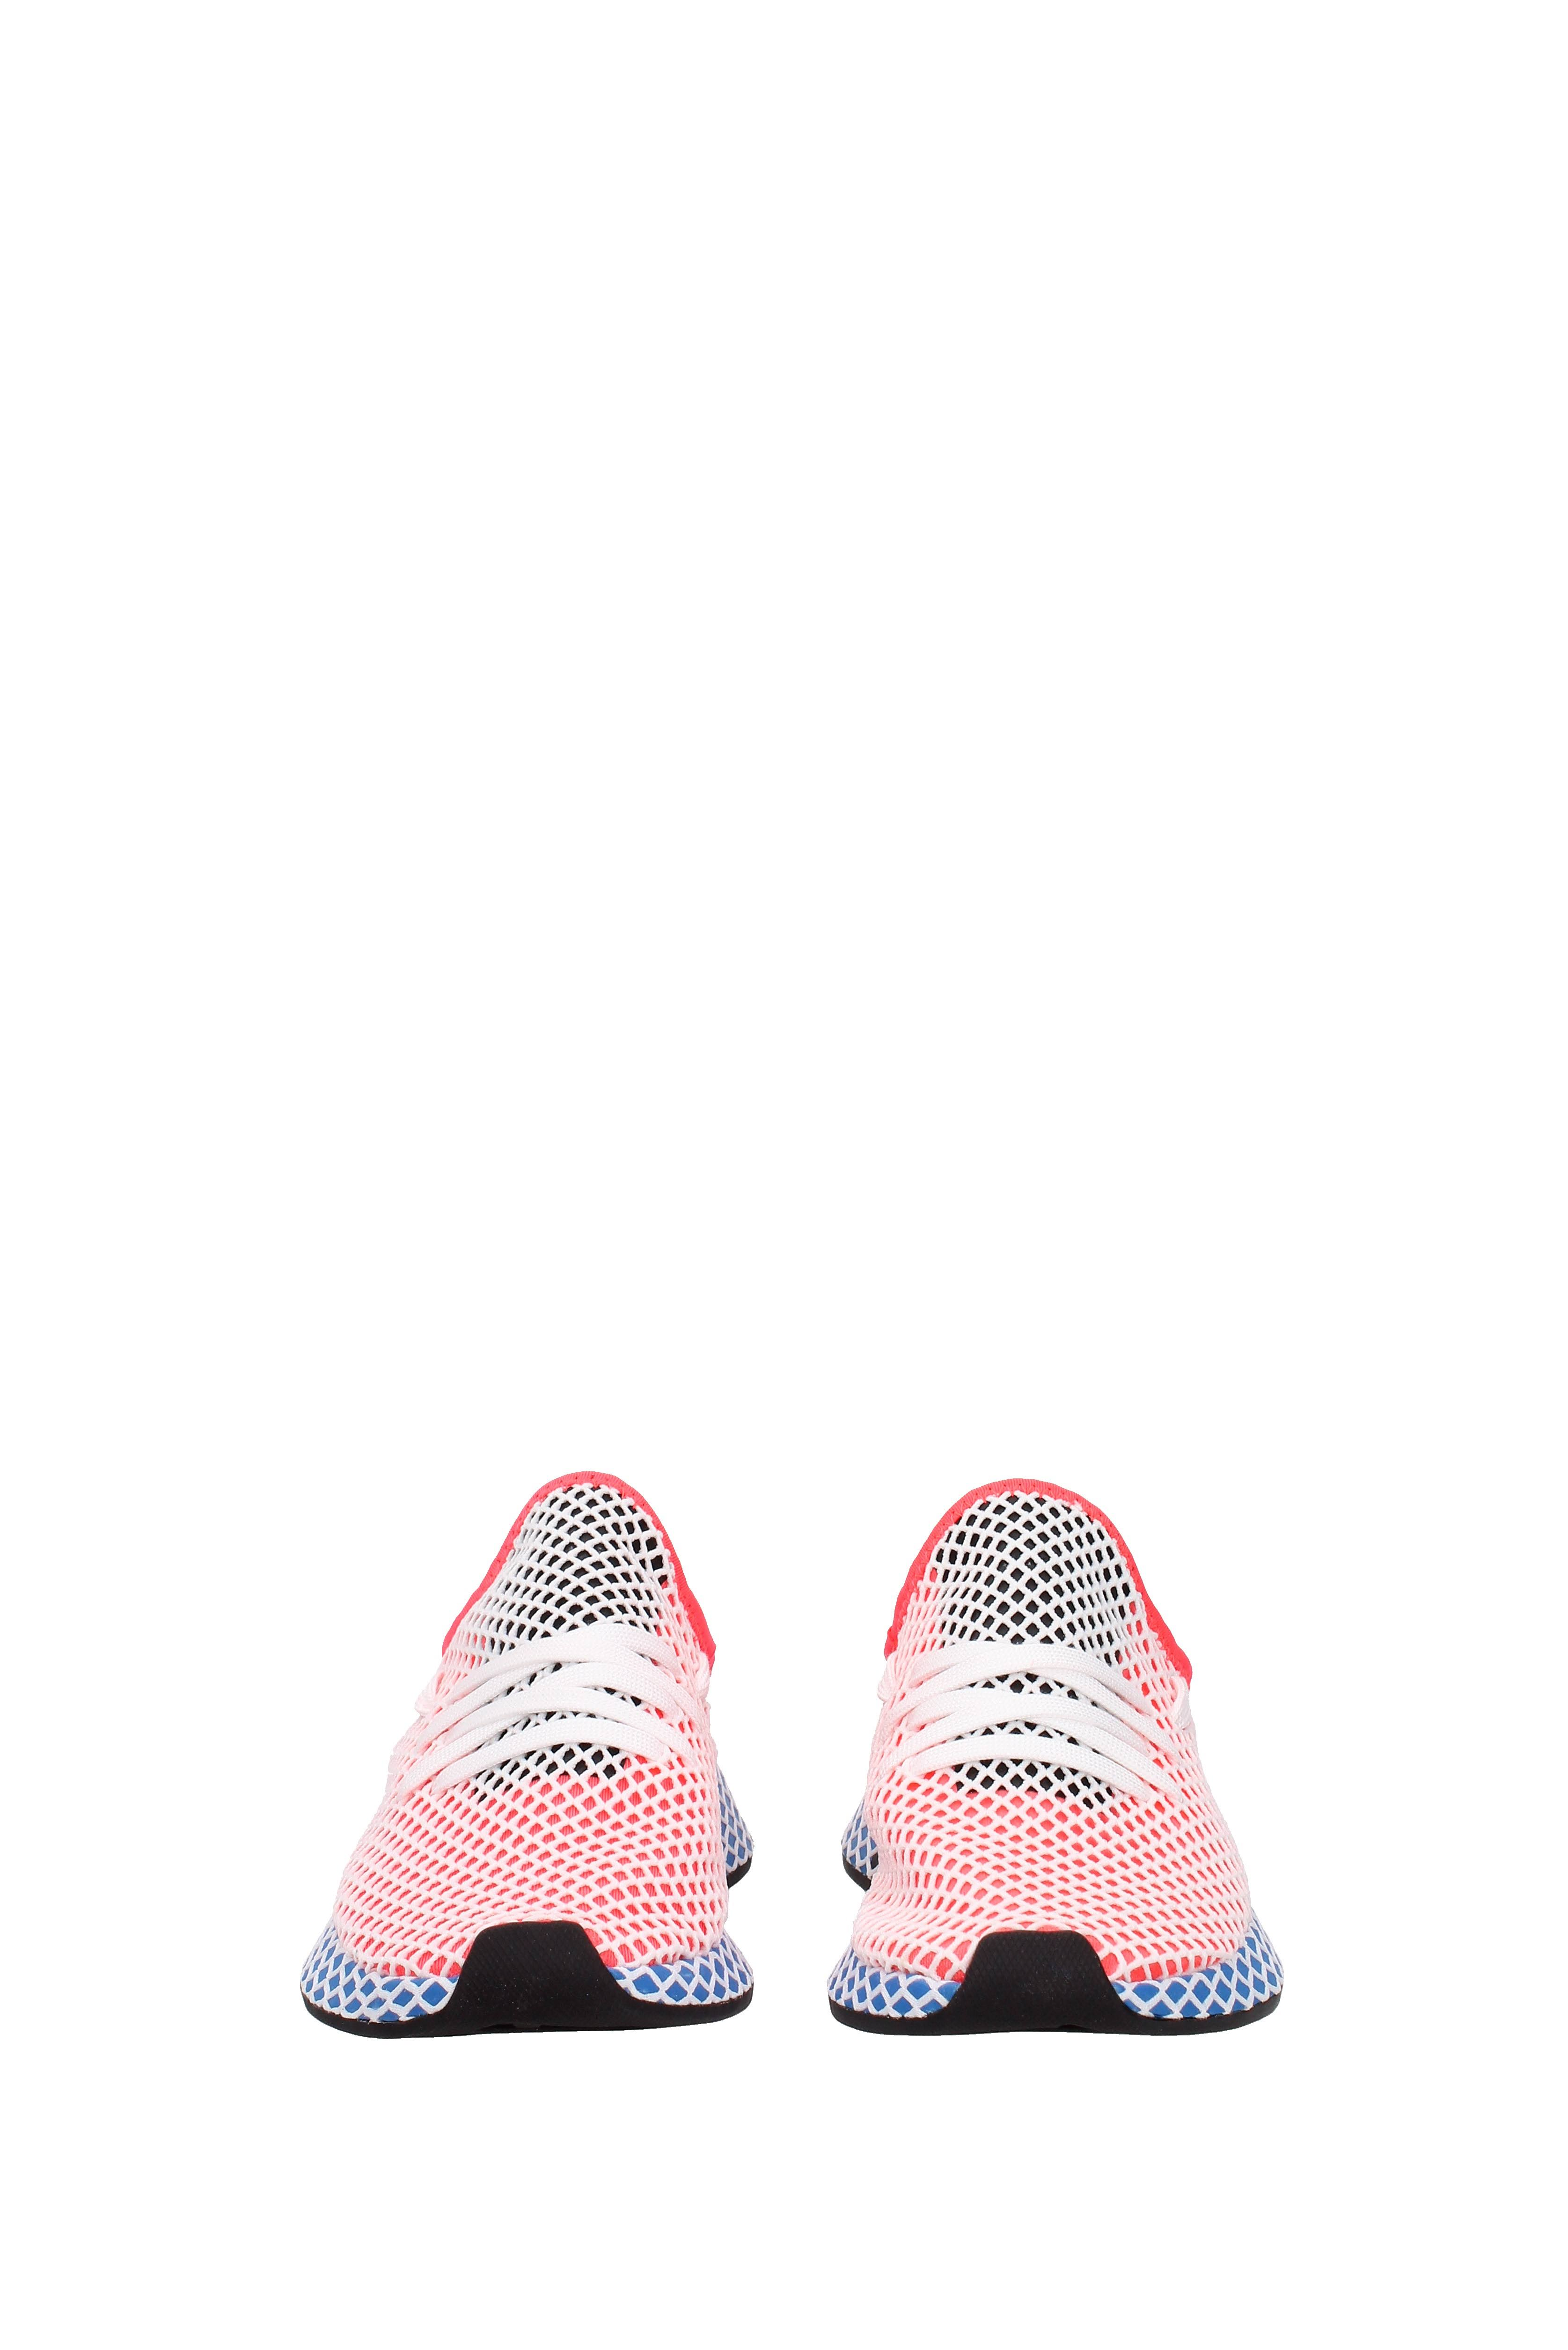 Adidas Color amp; Red O Bluebird Runner Deerupt Cq2624 Solar Originals OvwrqTfO